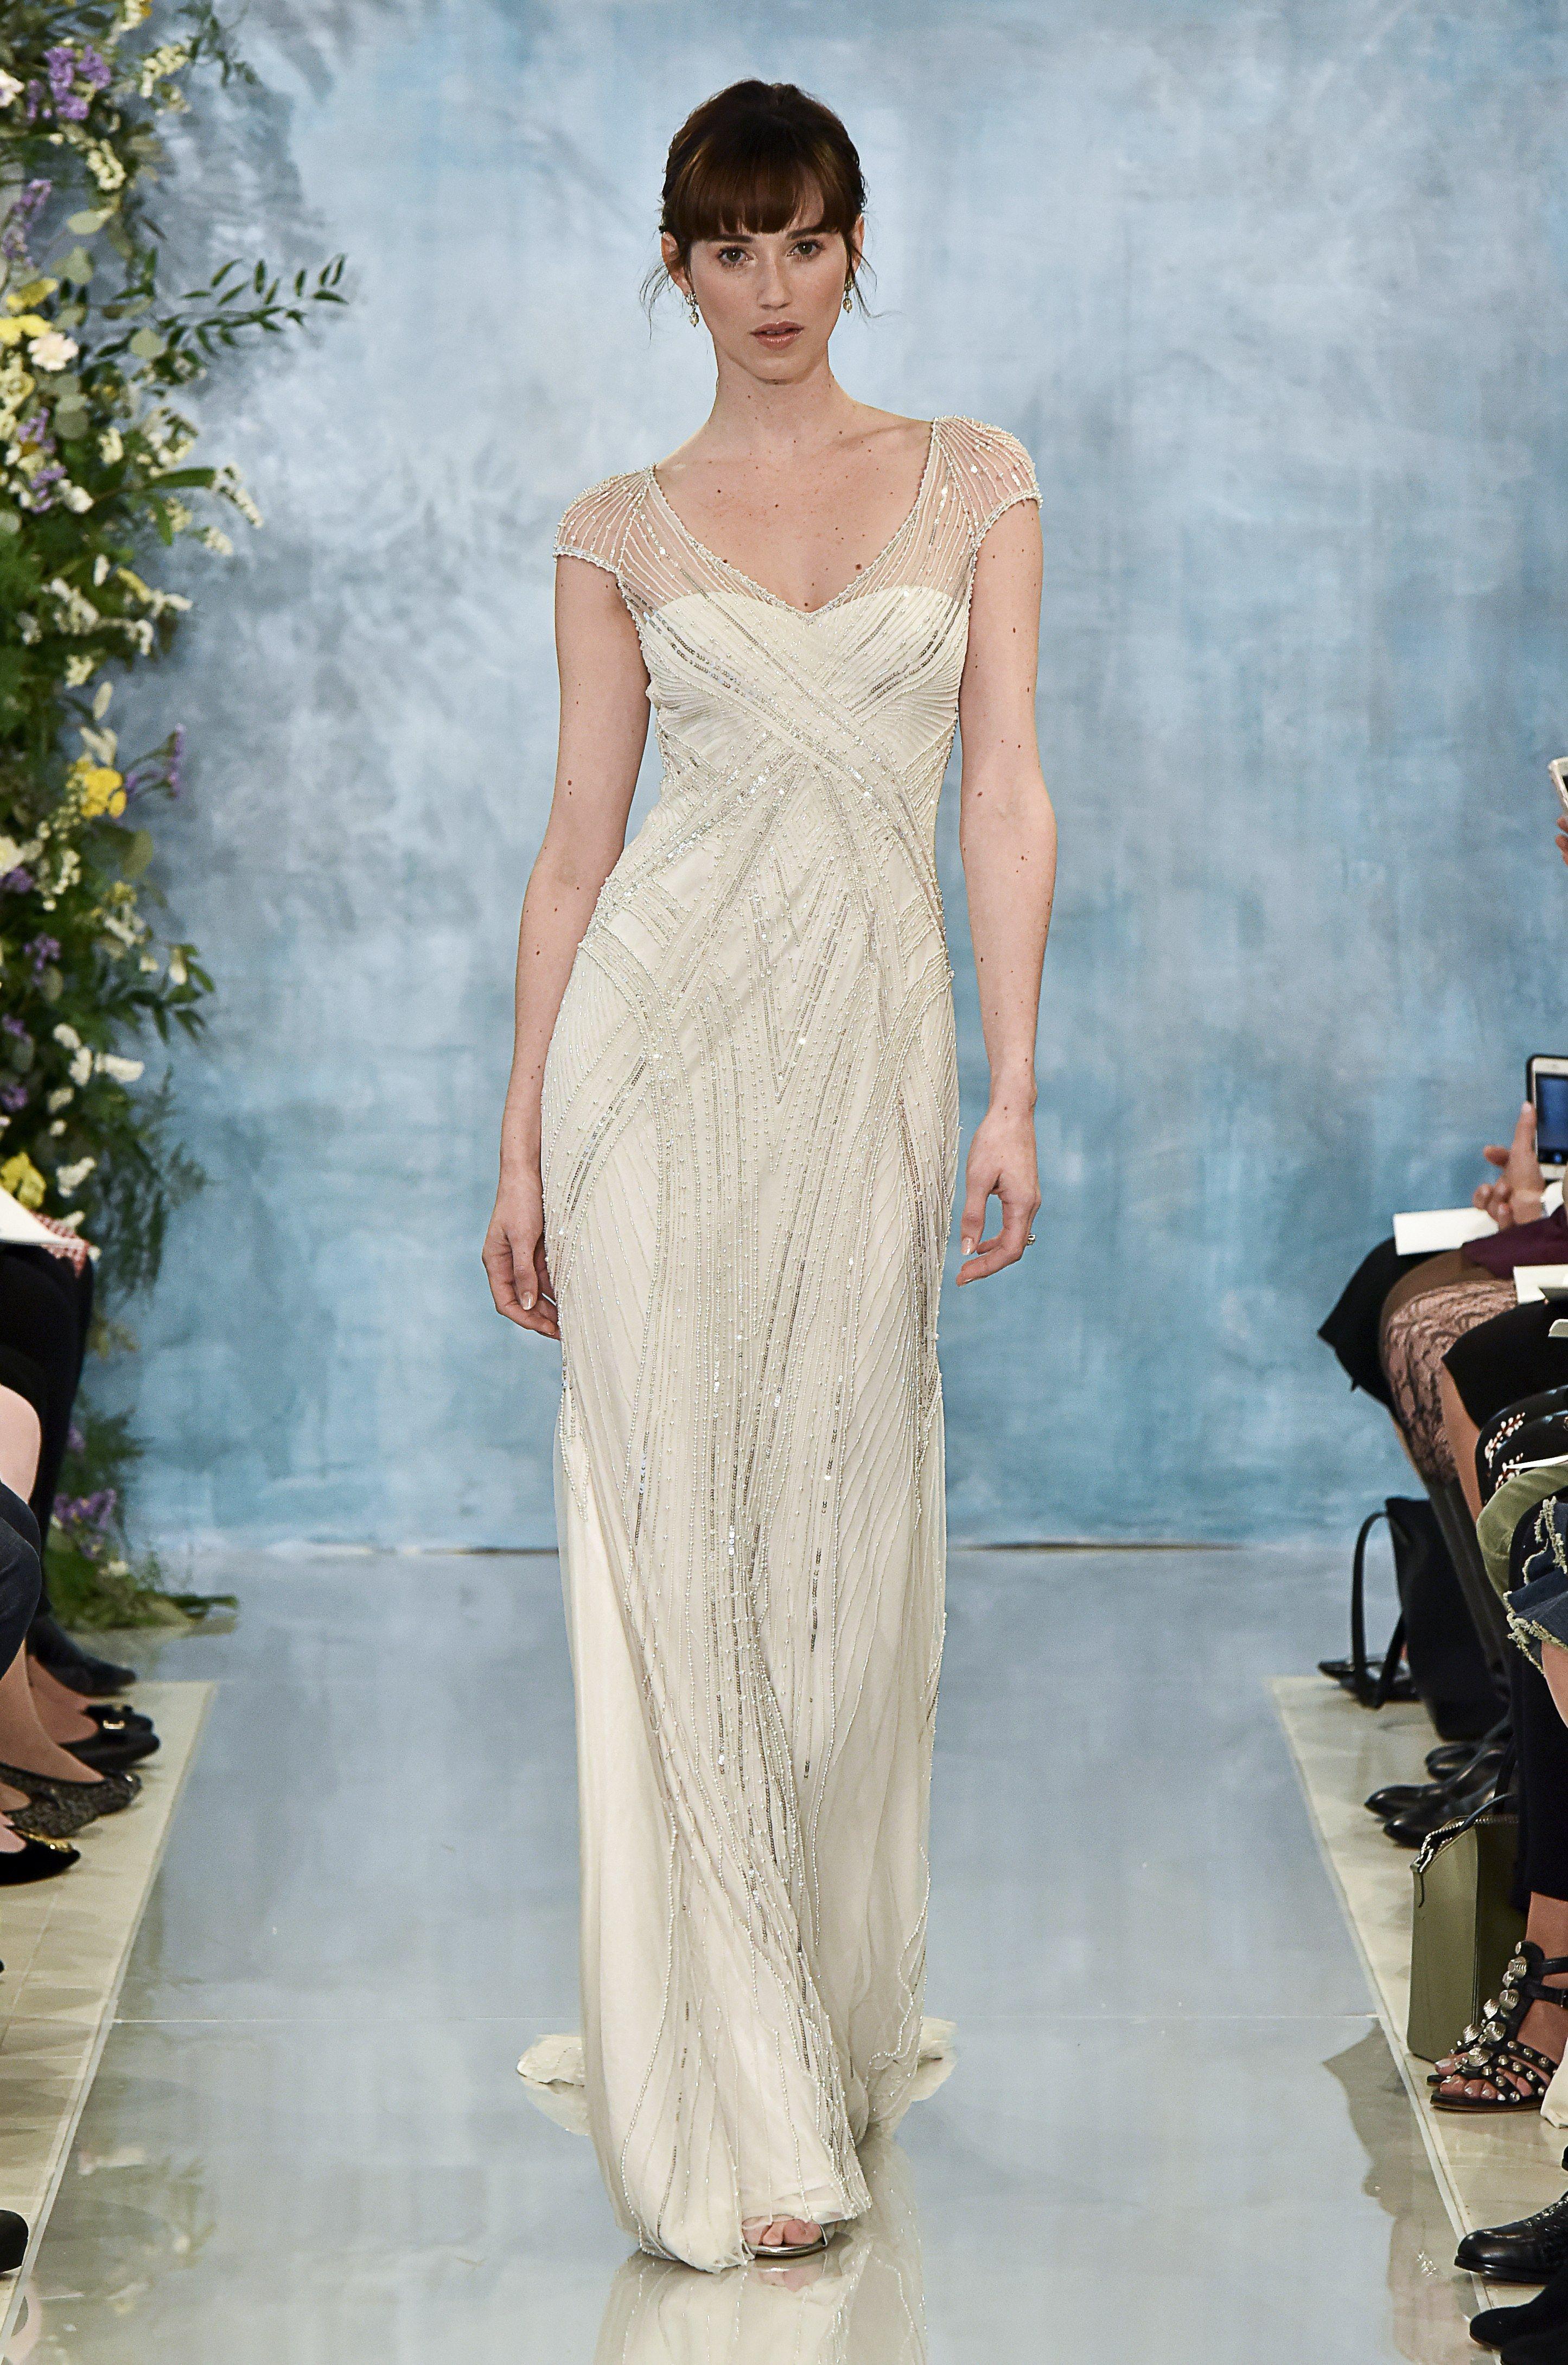 Großzügig Persian Wedding Dress Fotos - Hochzeit Kleid Stile Ideen ...